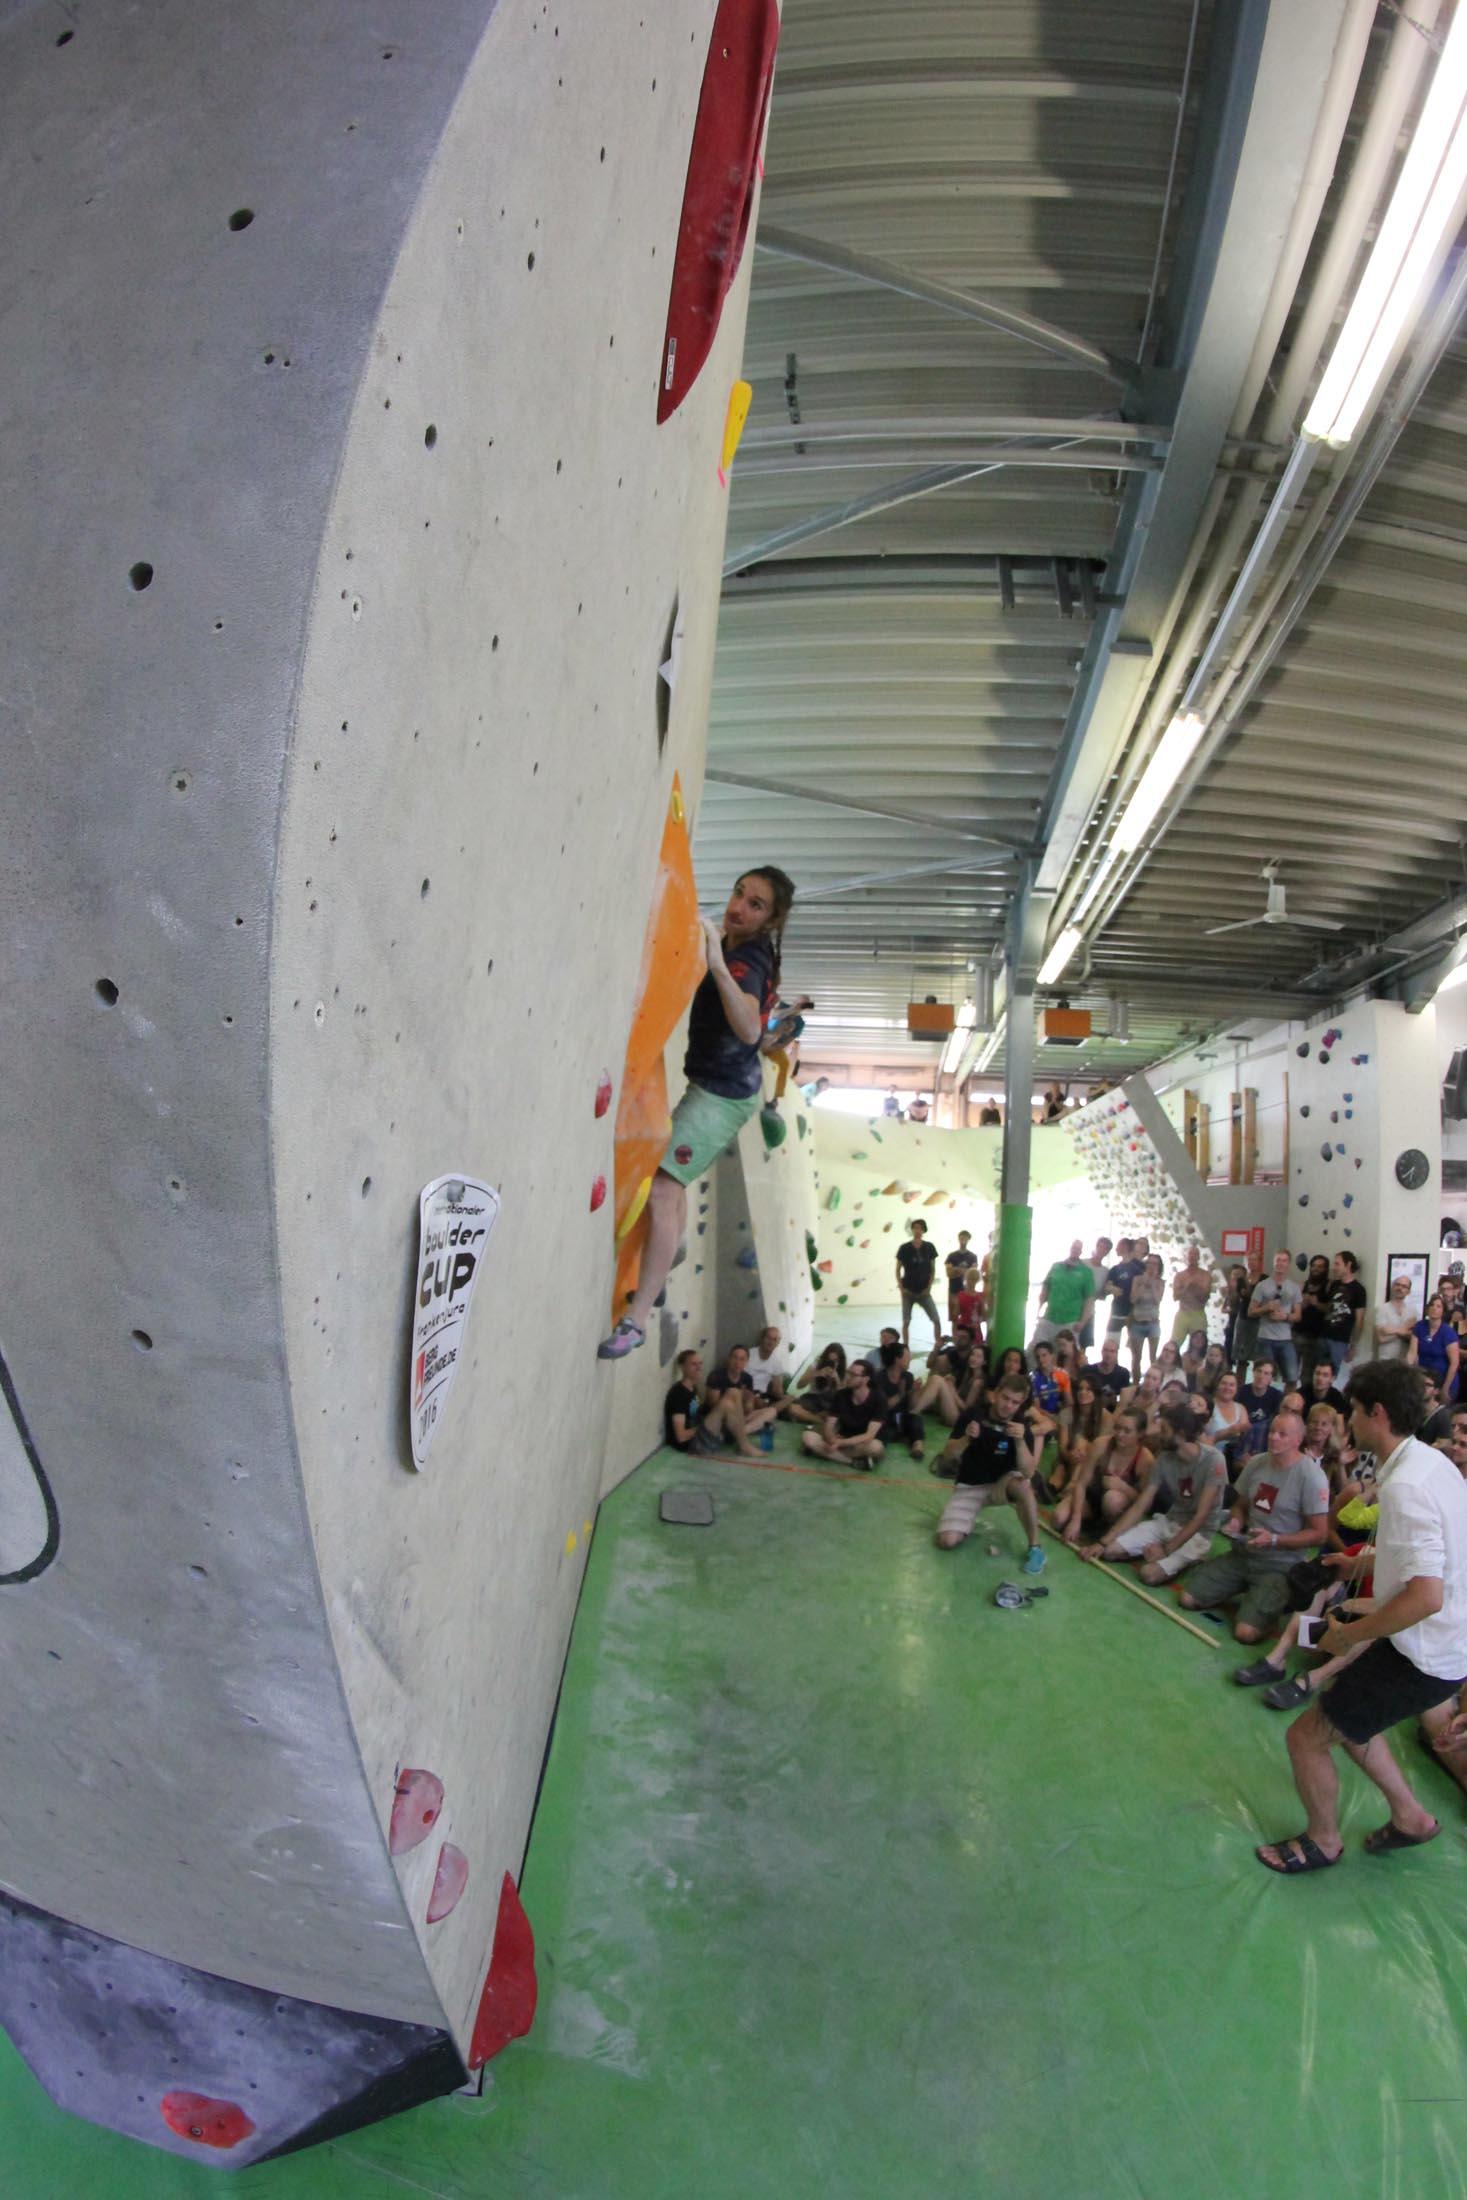 Finale, internationaler bouldercup Frankenjura 2016, BLOCKHELDEN Erlangen, Mammut, Bergfreunde.de, Boulderwettkampf07092016478